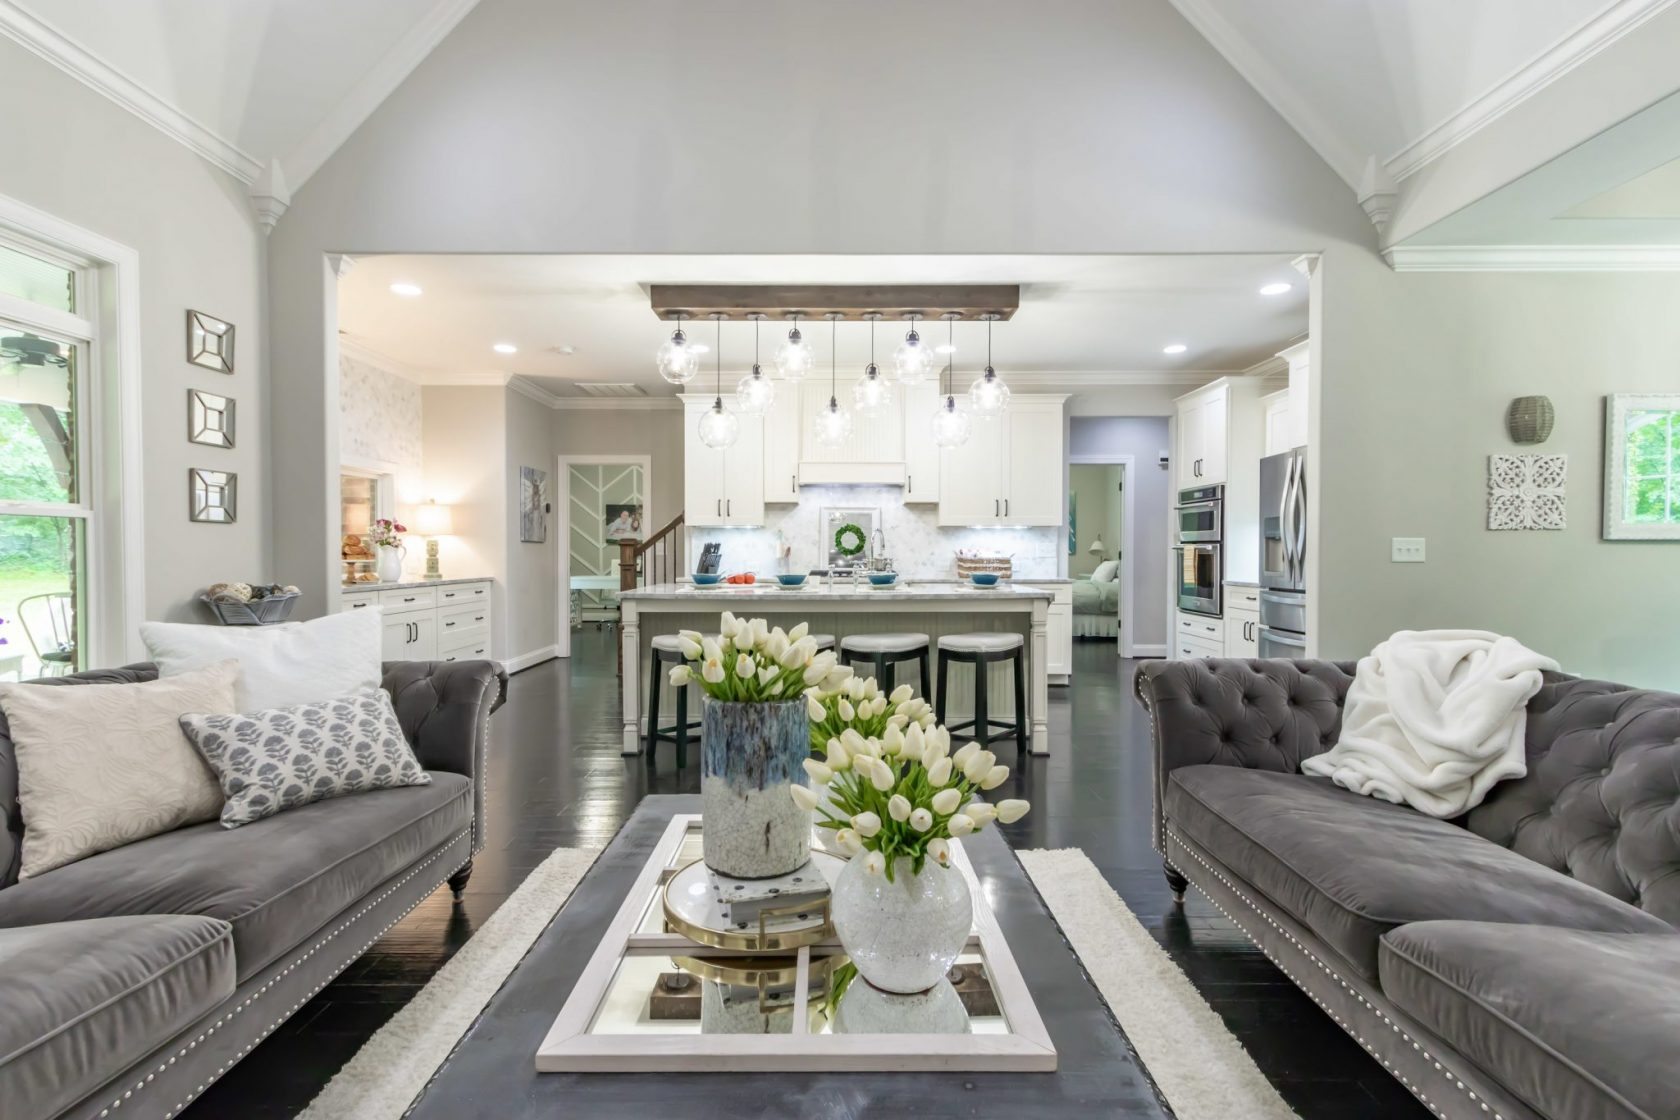 new-year-house-improvements-for-burlington-homes-team-logue-interior-design